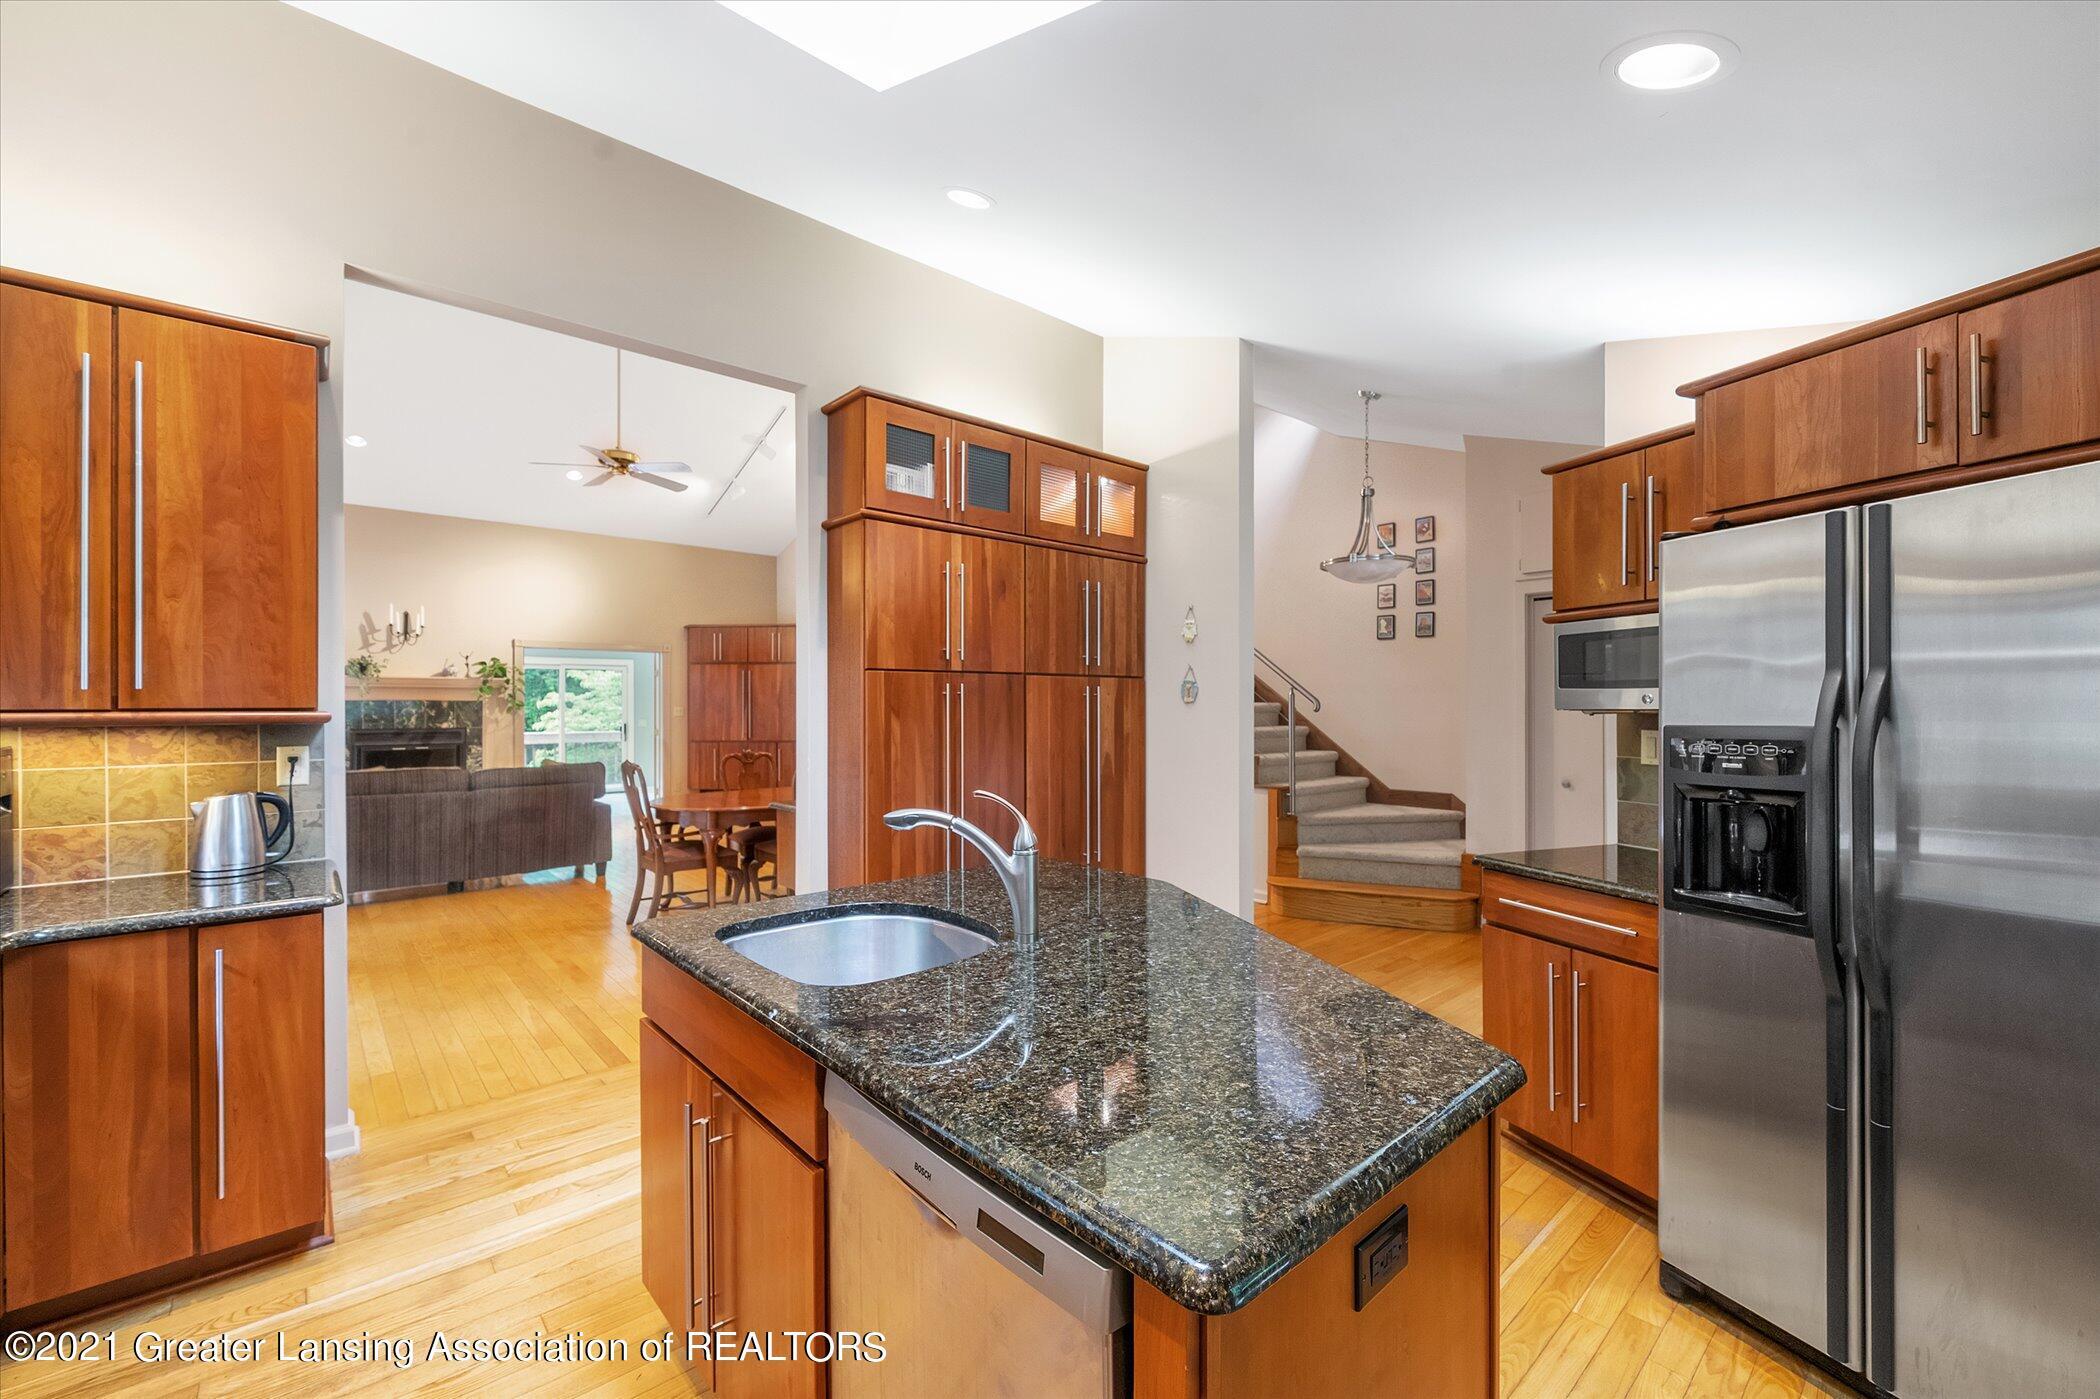 442 Shoesmith Rd - (14) MAIN FLOOR Kitchen - 15